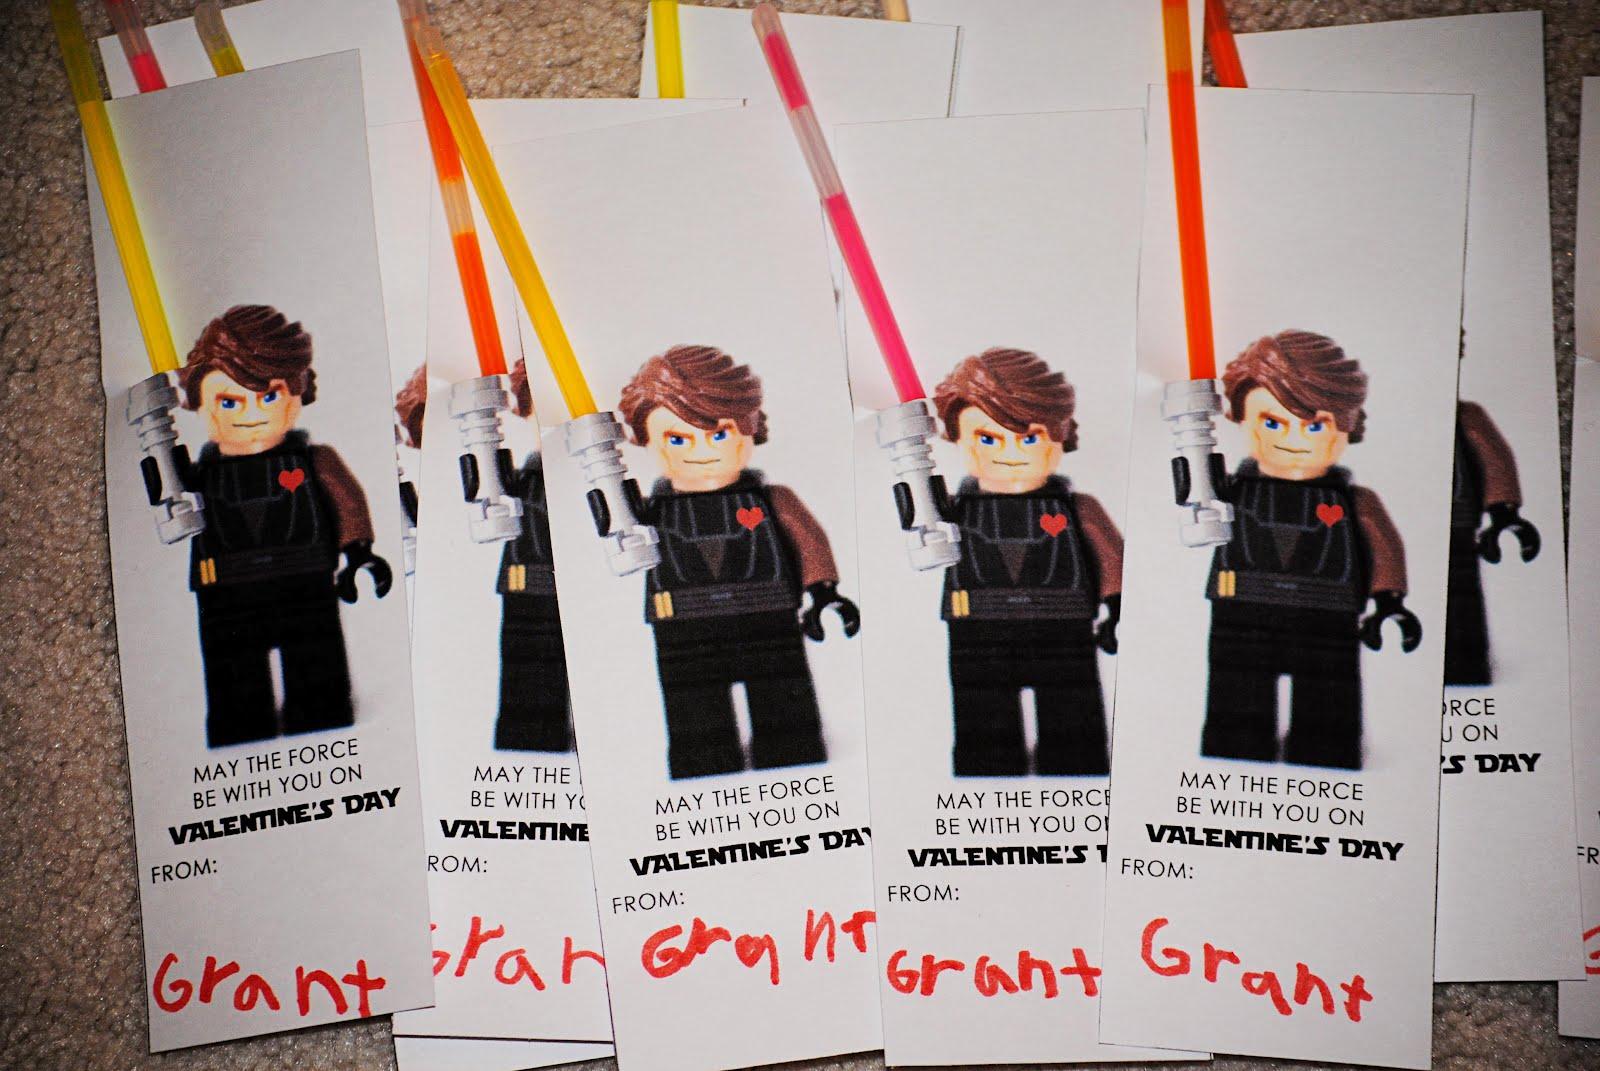 valentines day lego man light sabor cards - Valentines For Kindergarten Class